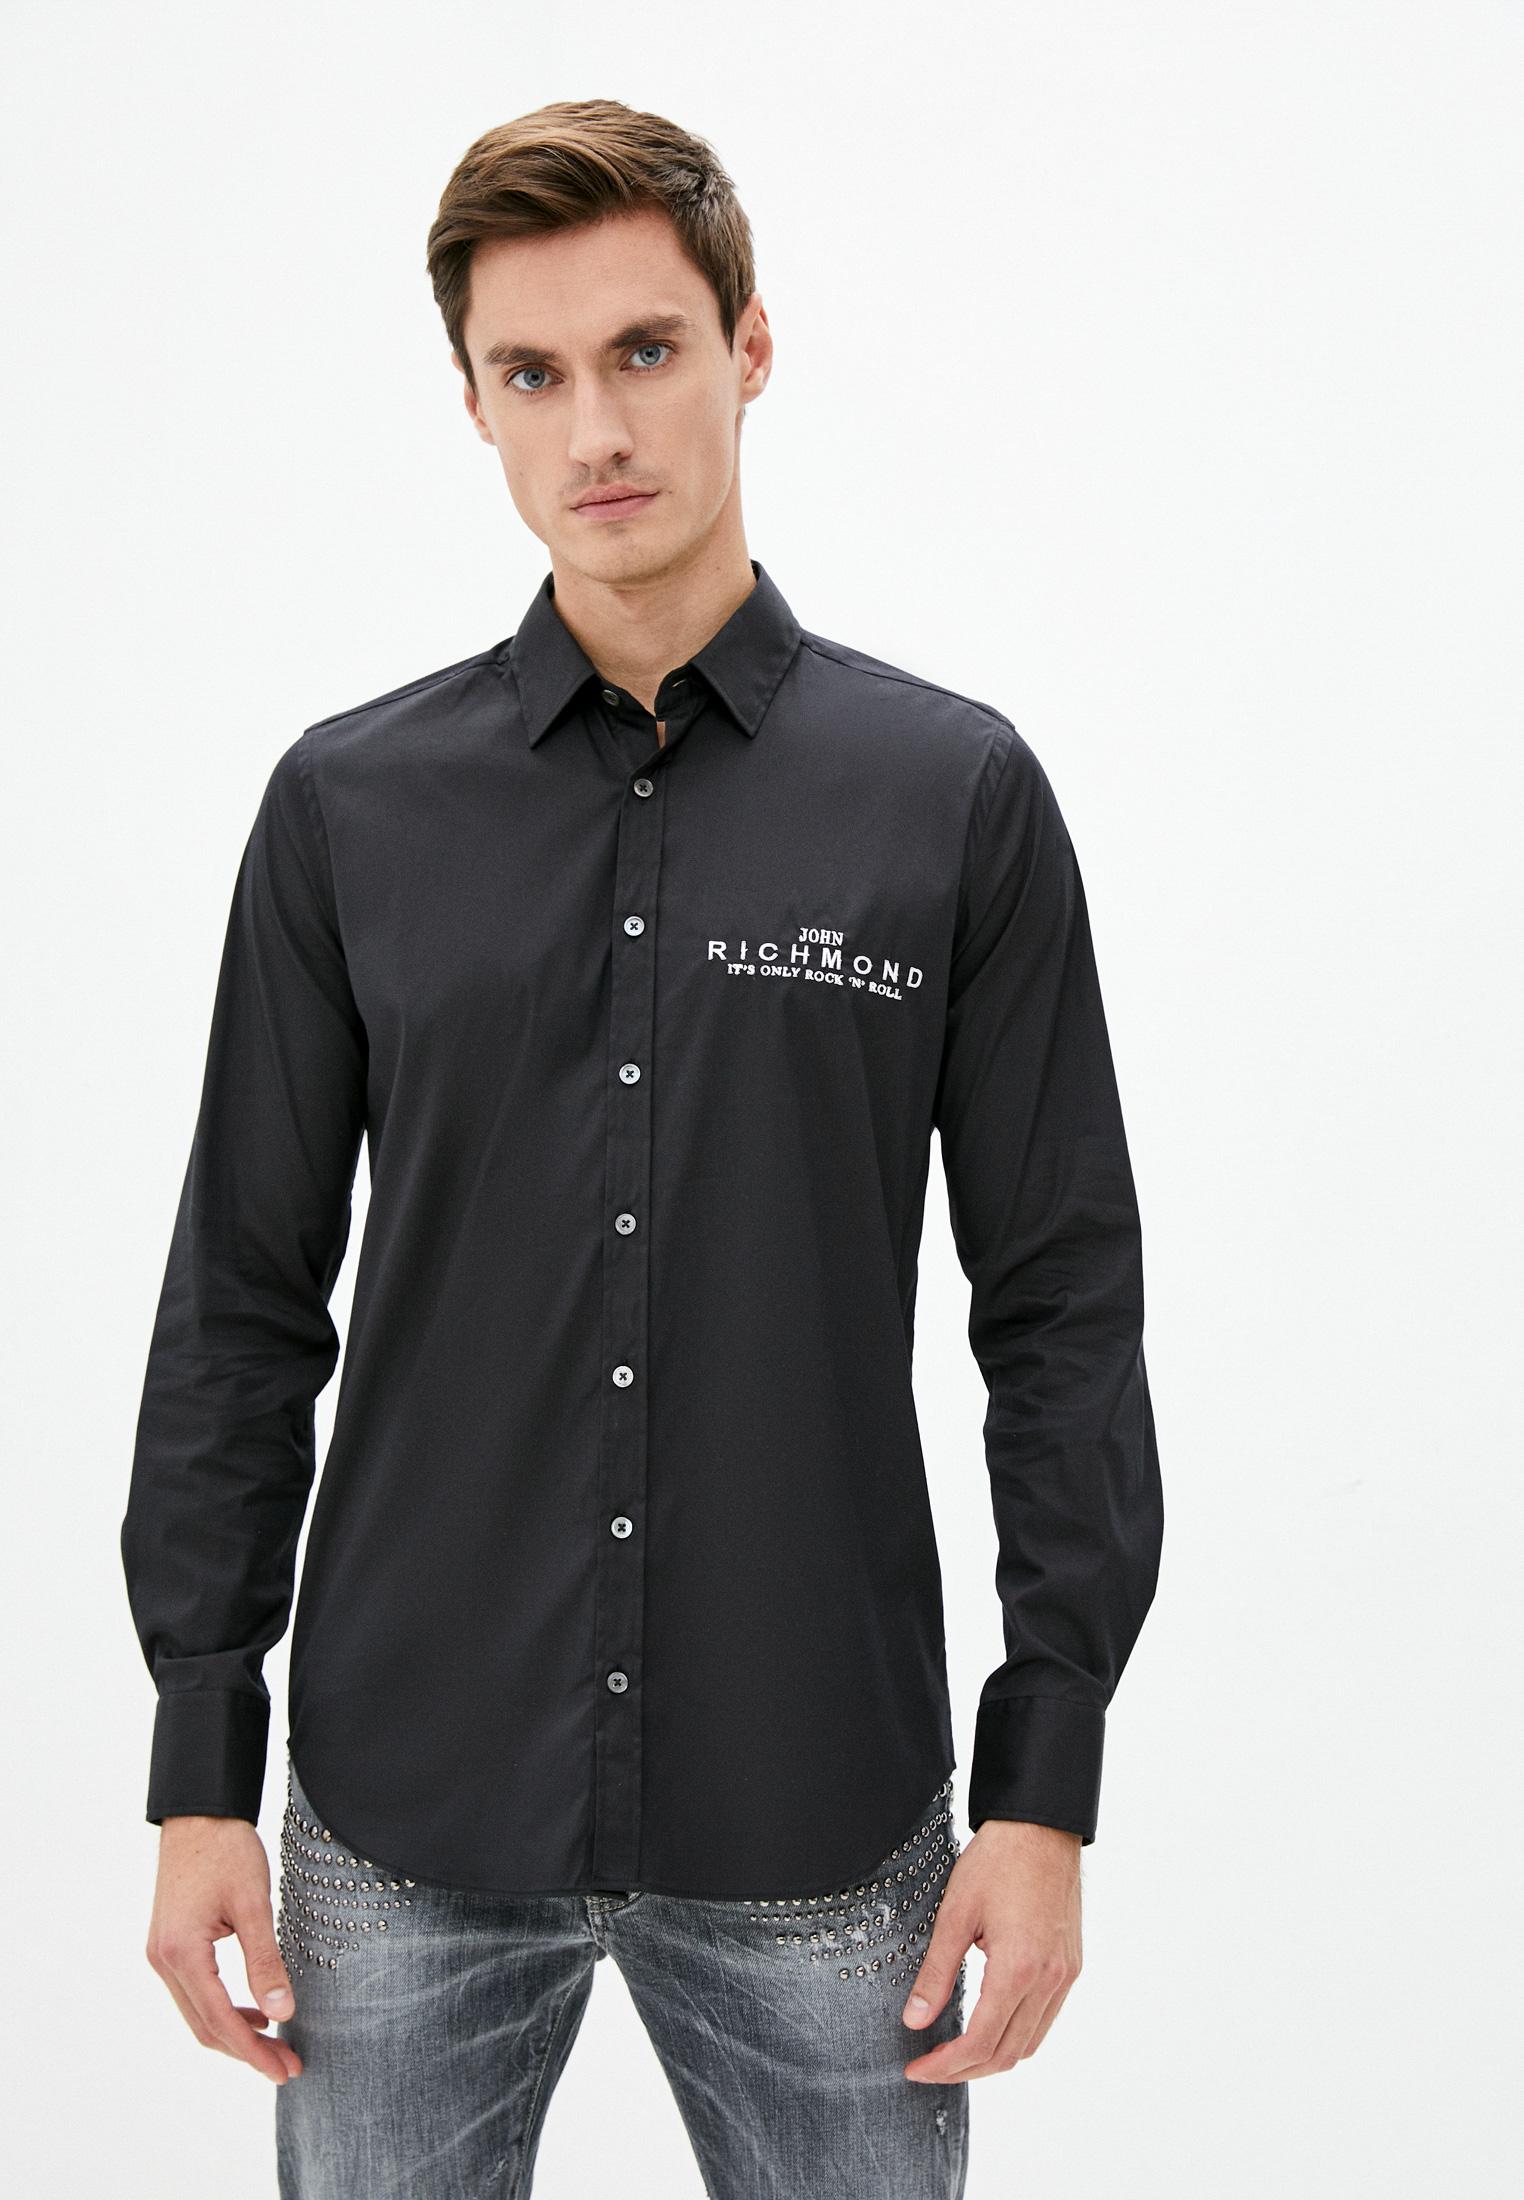 Рубашка с длинным рукавом John Richmond (Джон Ричмонд) RMP20234CA